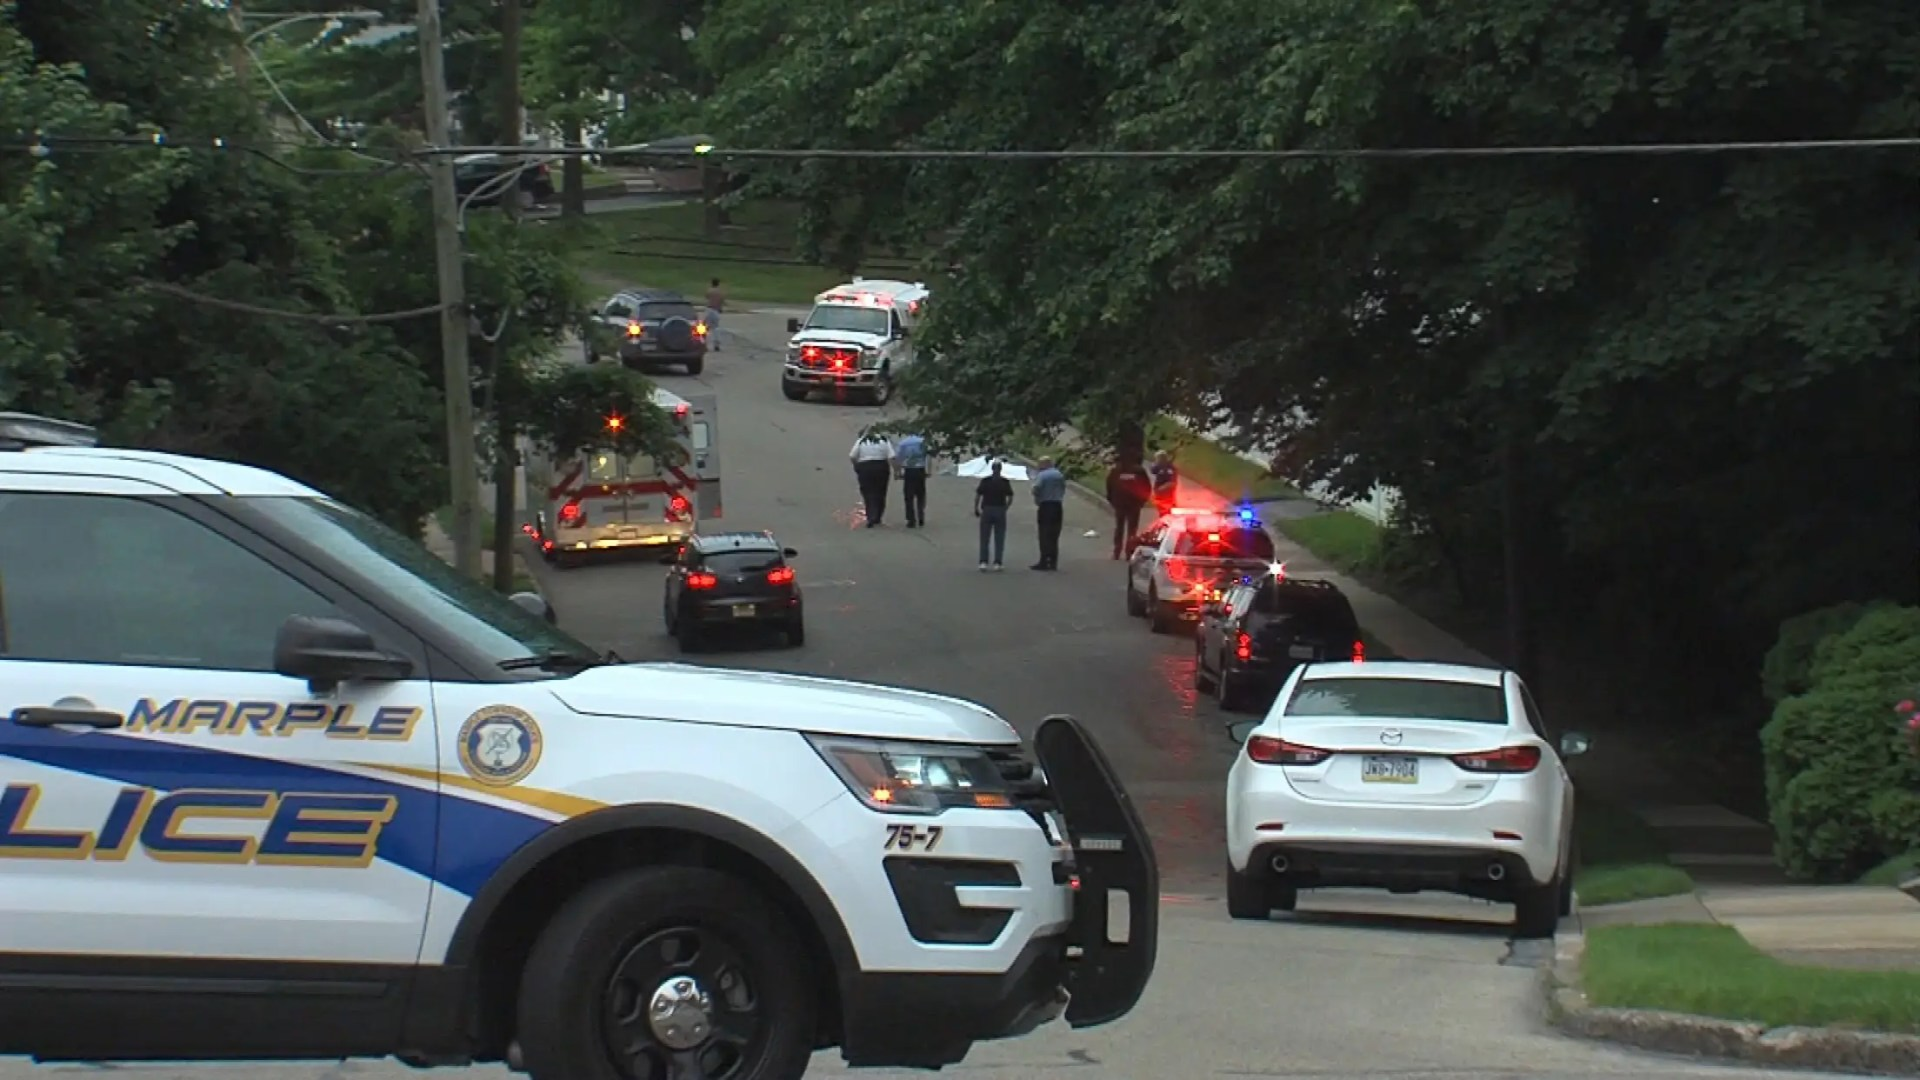 Marple Township Fatal Accident